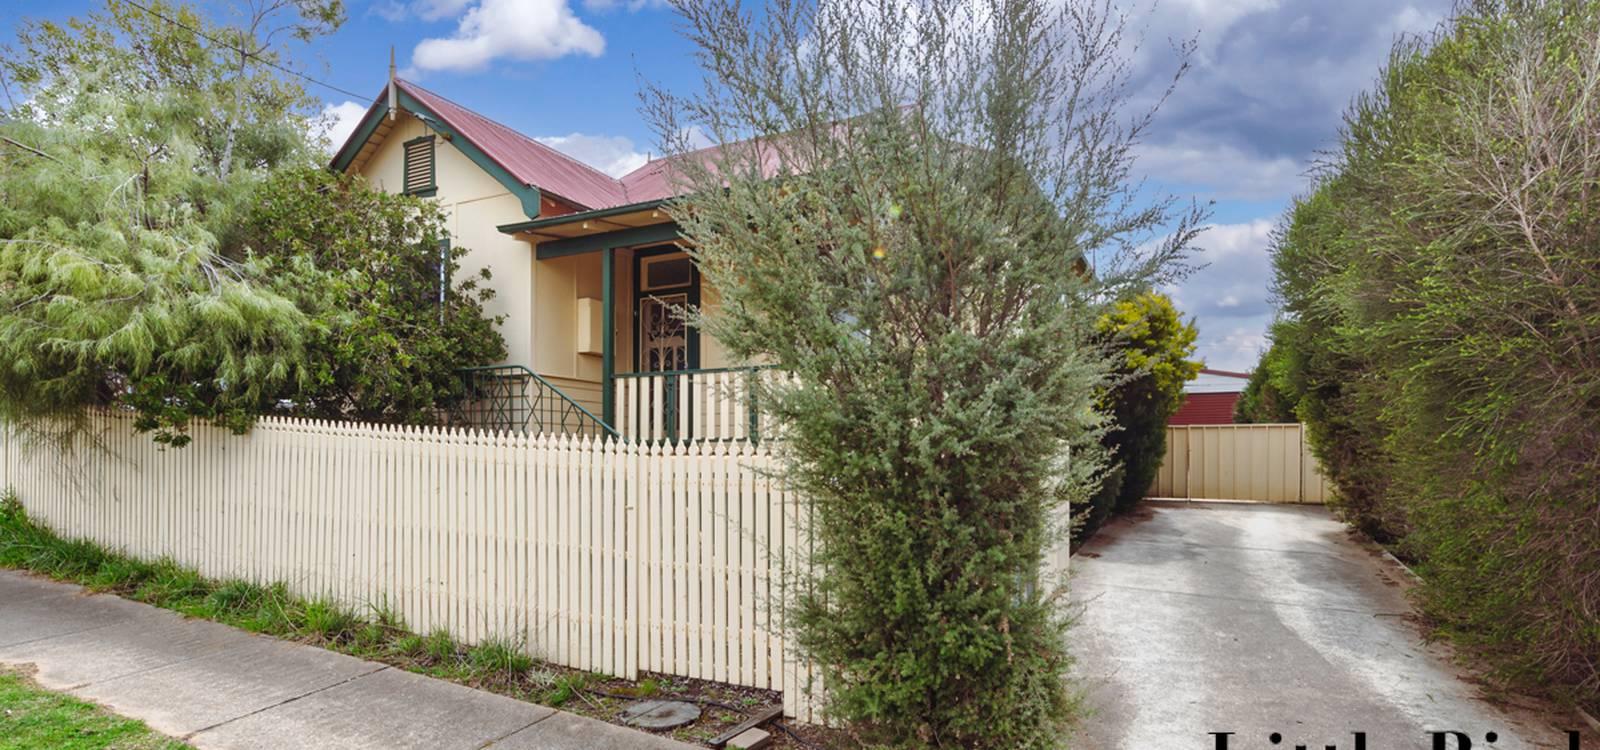 14 Moore Street QUEANBEYAN, NSW 2620 - photo 1